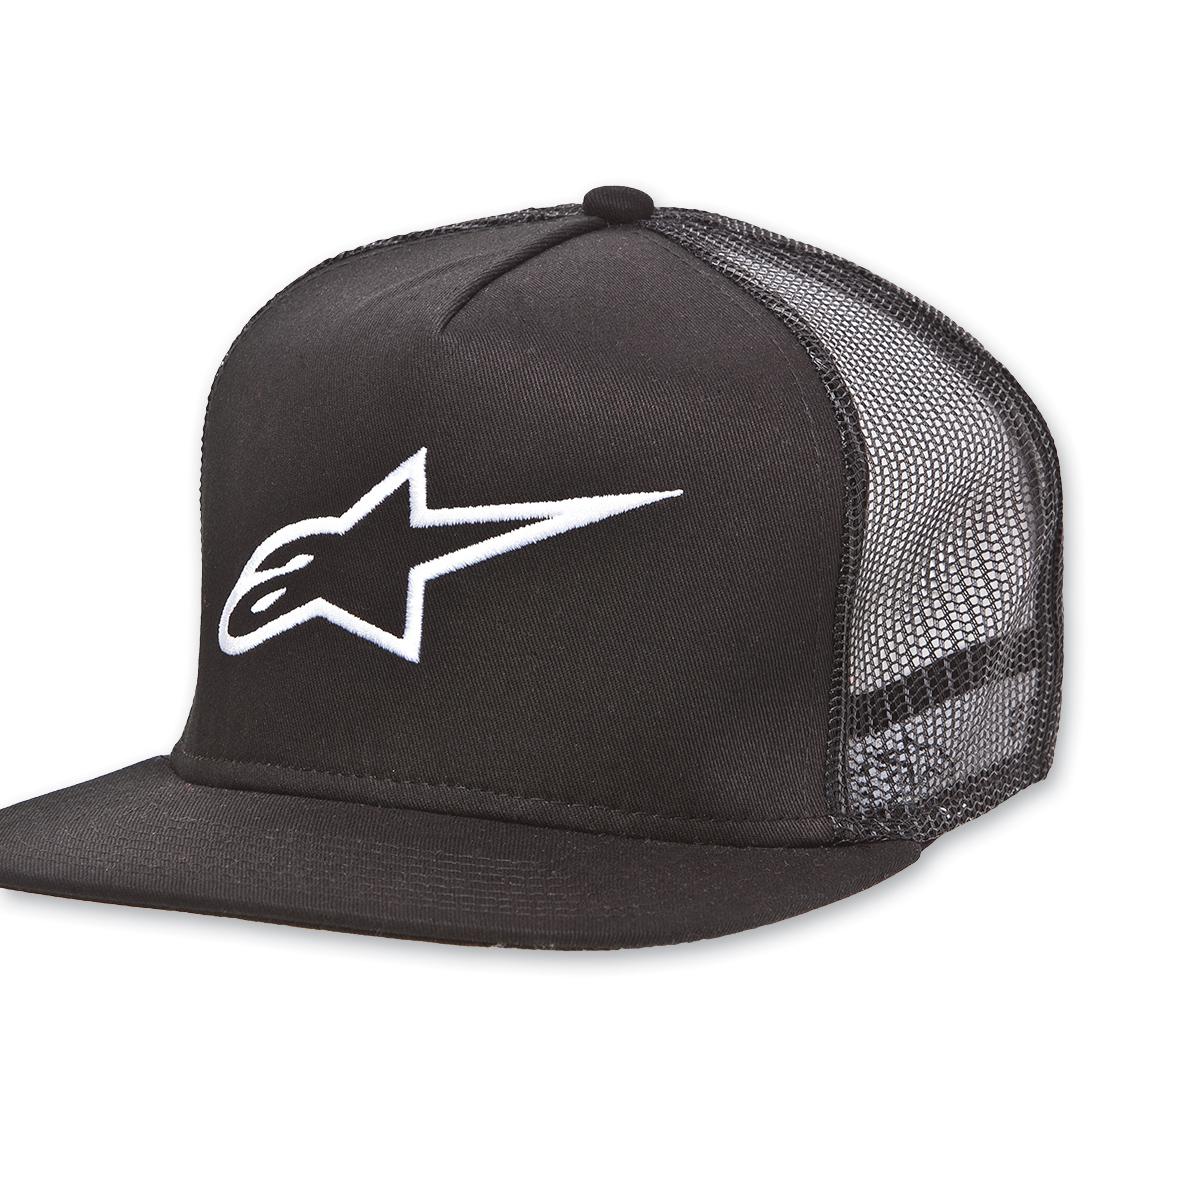 Alpinestars Corp Trucker Black Hat